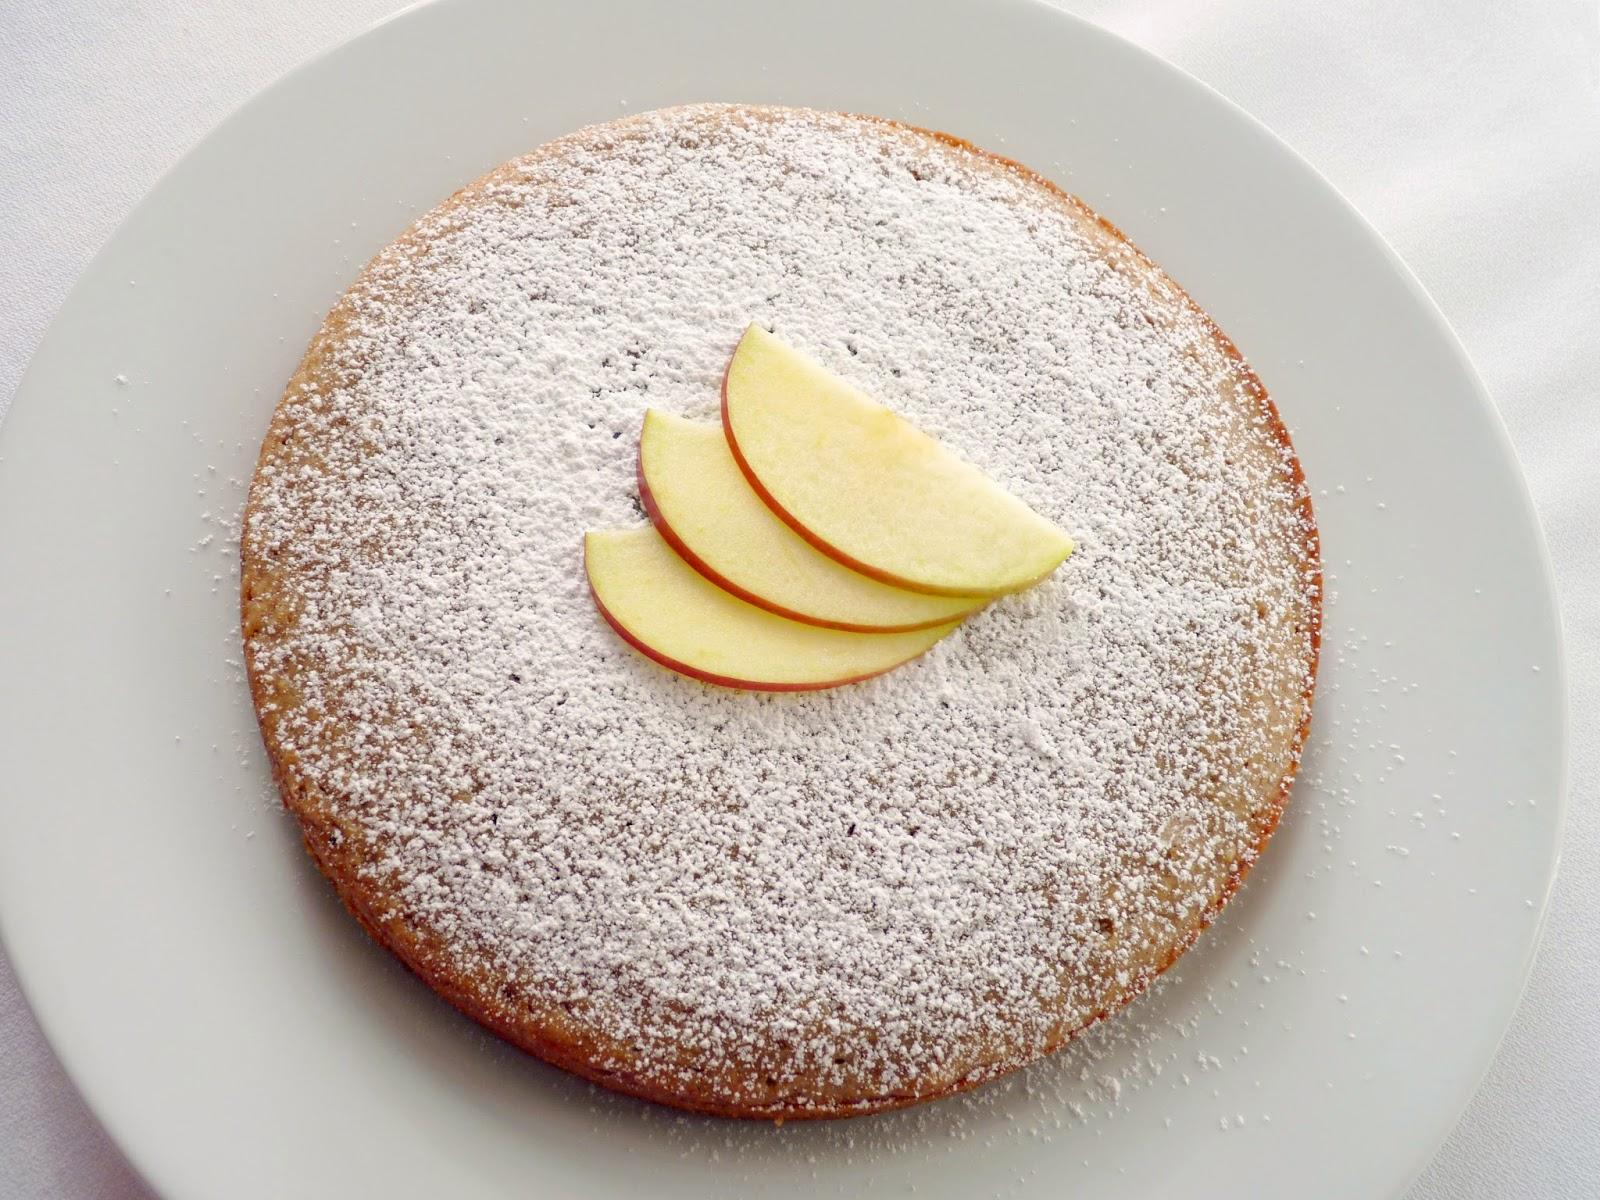 pastry studio: Applesauce Spice Cake